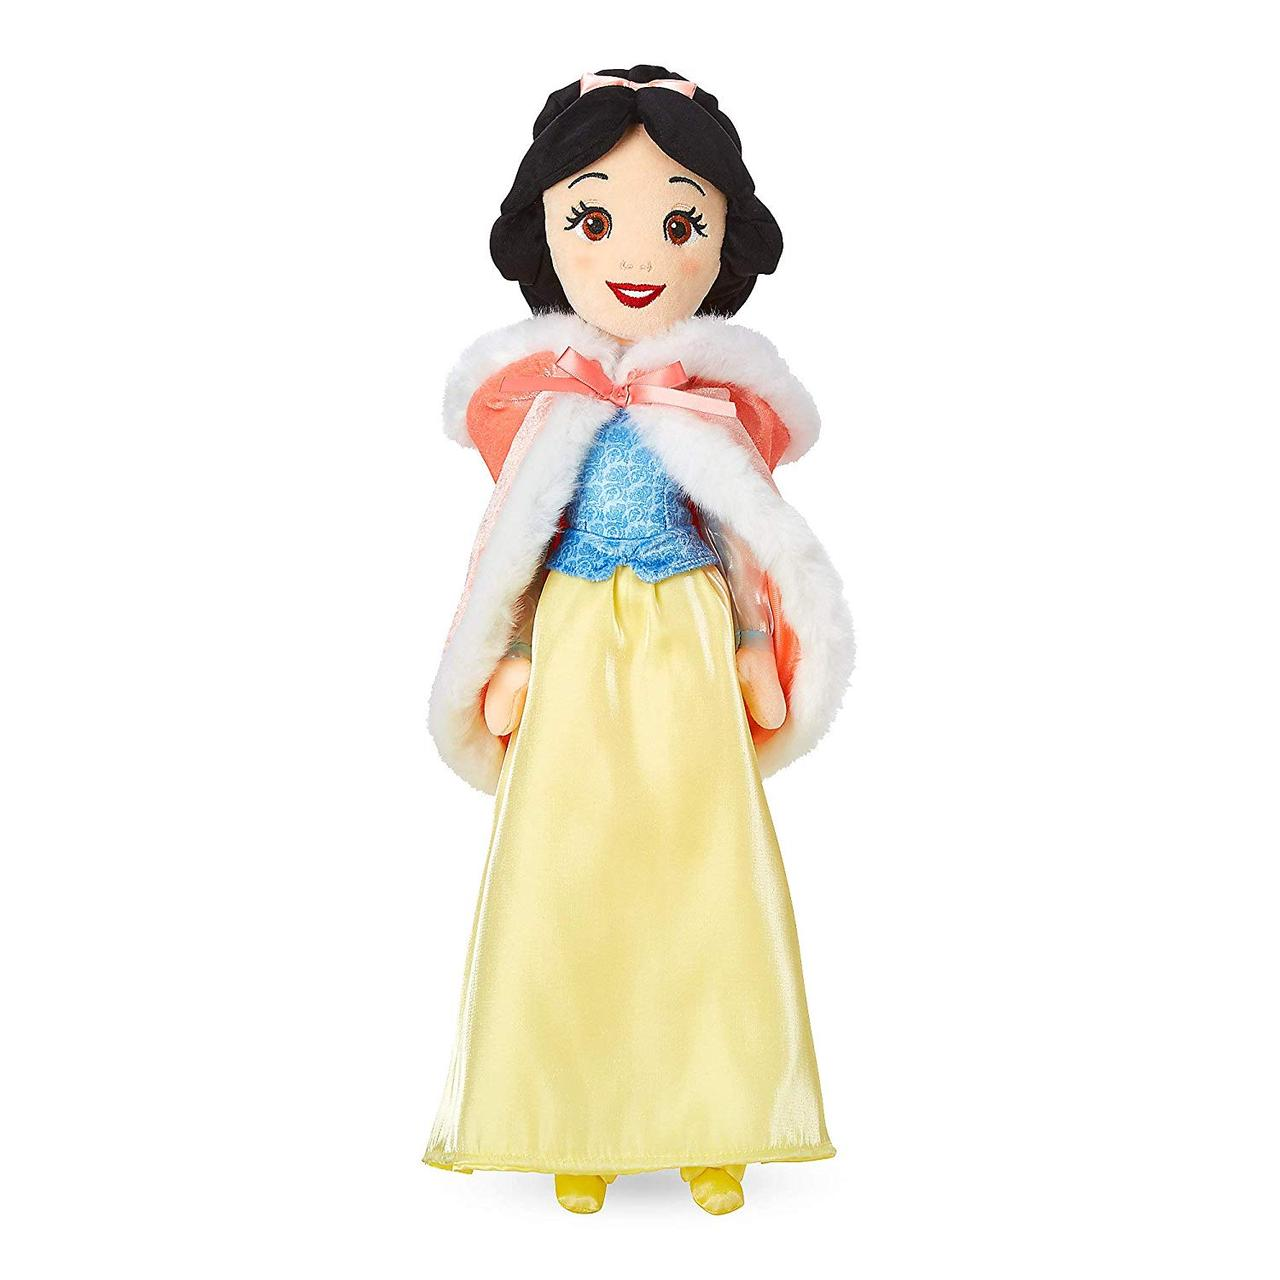 Disney Мягкая игрушка кукла Белоснежка в меховой накидке Snow White Plush Doll in Winter Cape Medium 19 Inch